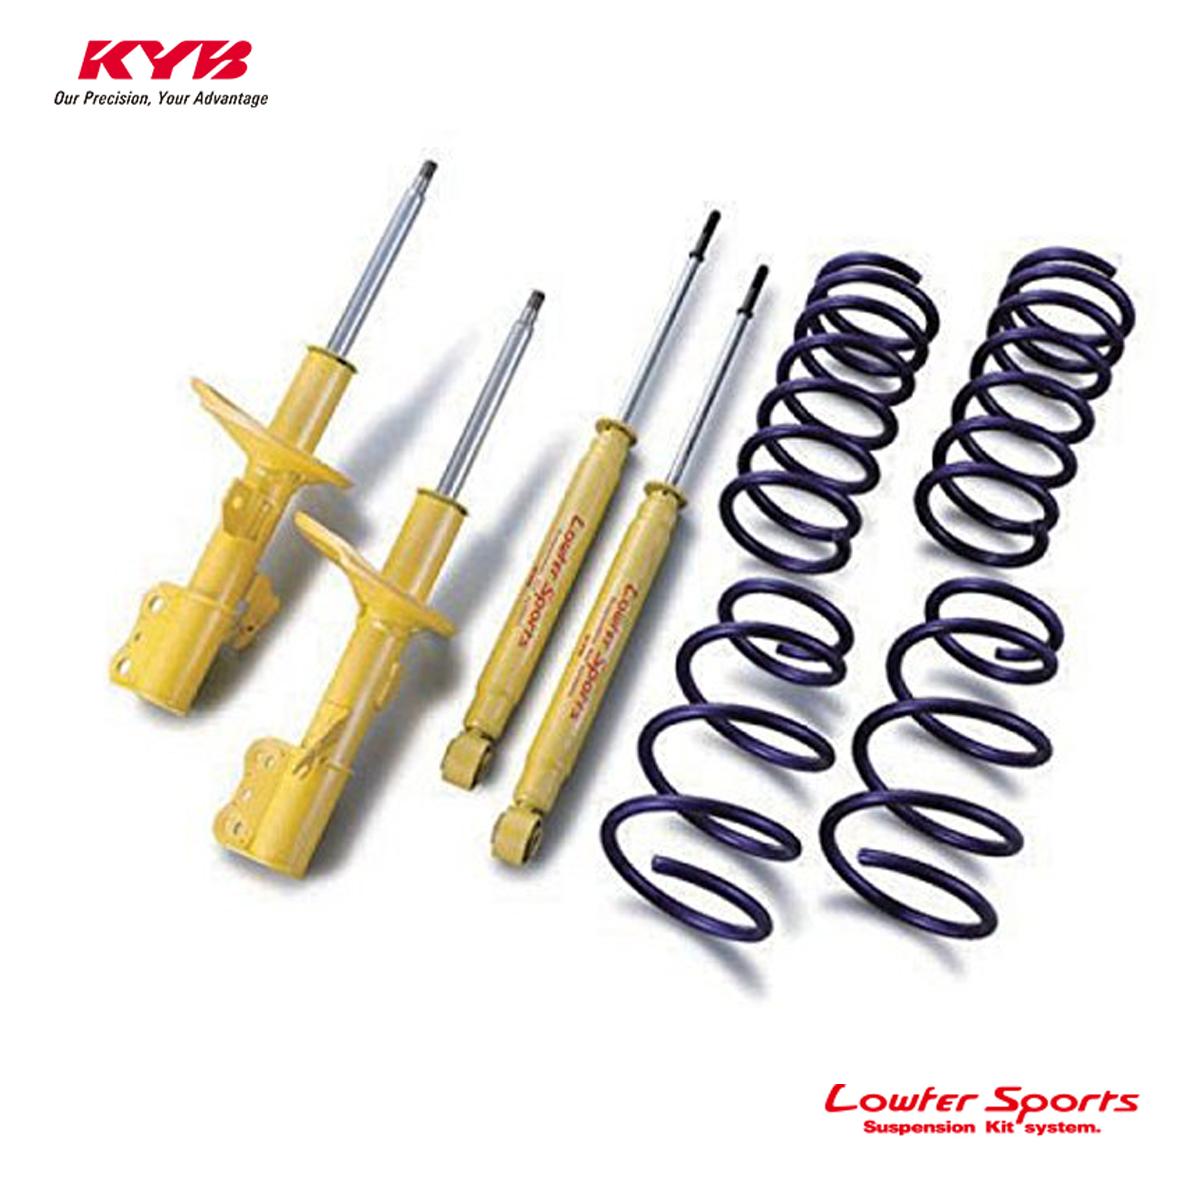 KYB カヤバ ソリオ MA15S ショックアブソーバー サスペンションキット 1台分 ローファースポーツ キット Lowfer Sports LKIT-MA15S